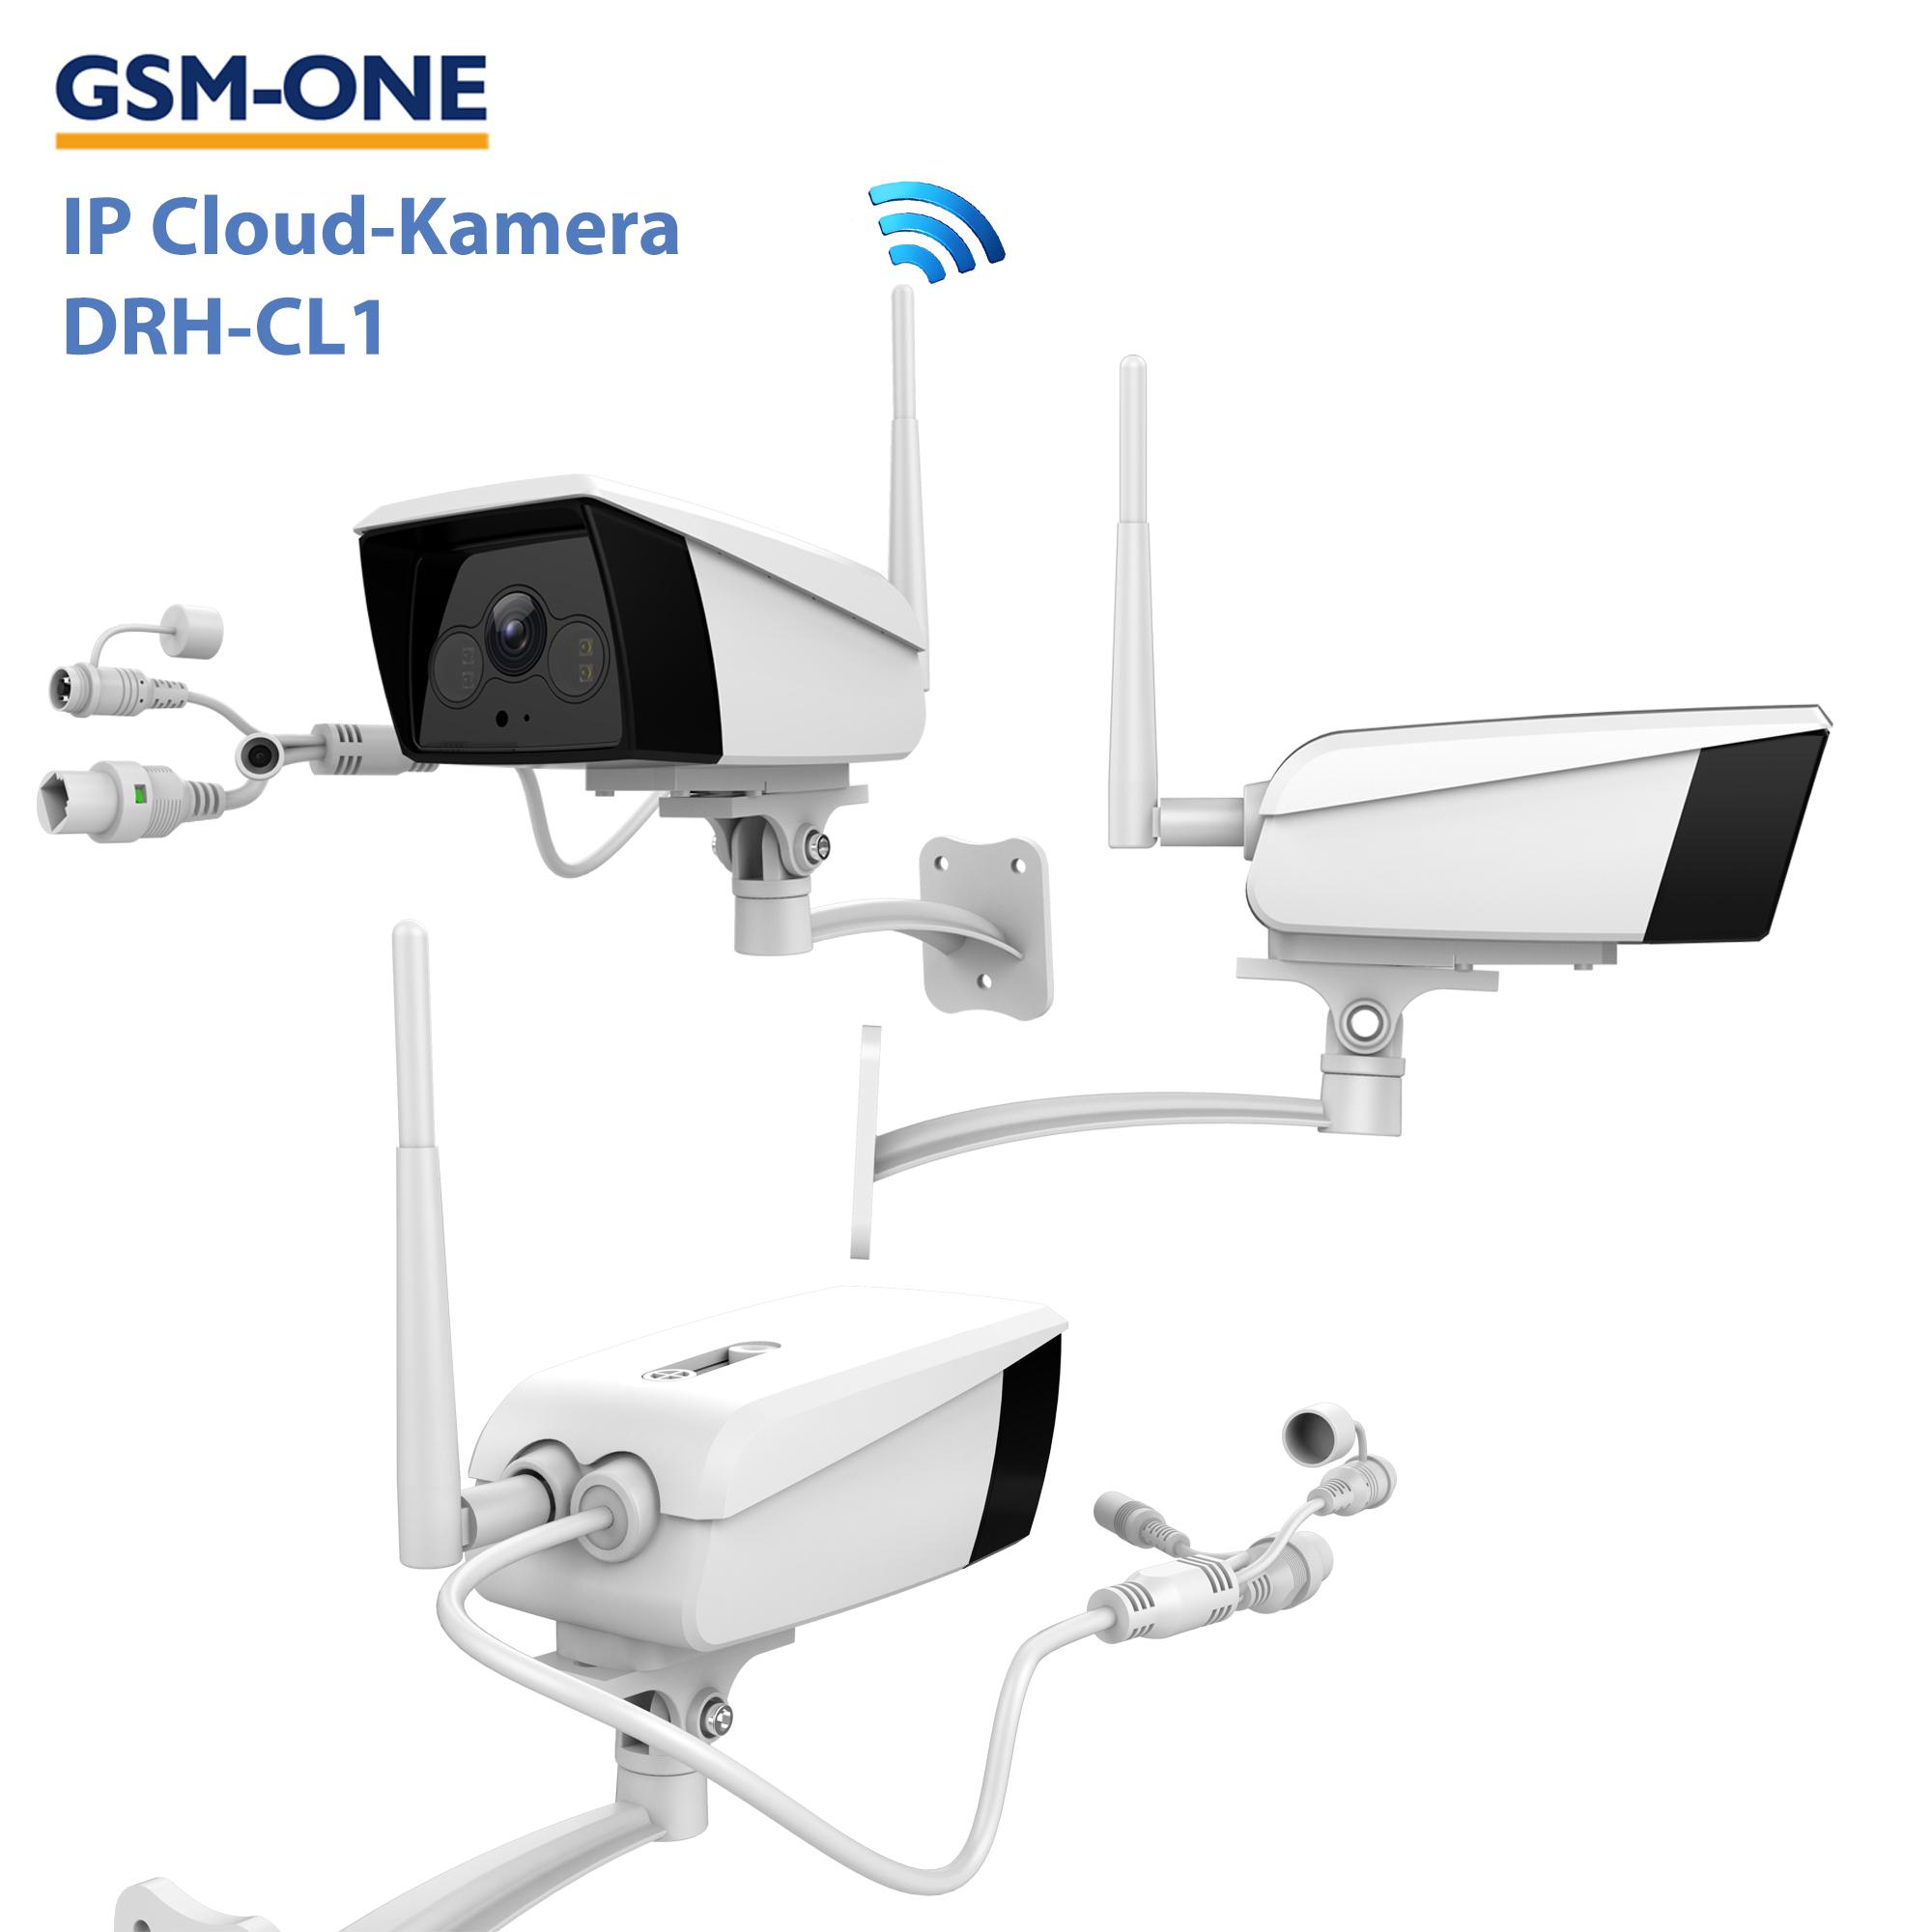 IP CLOUD Kamera DRH-CL1